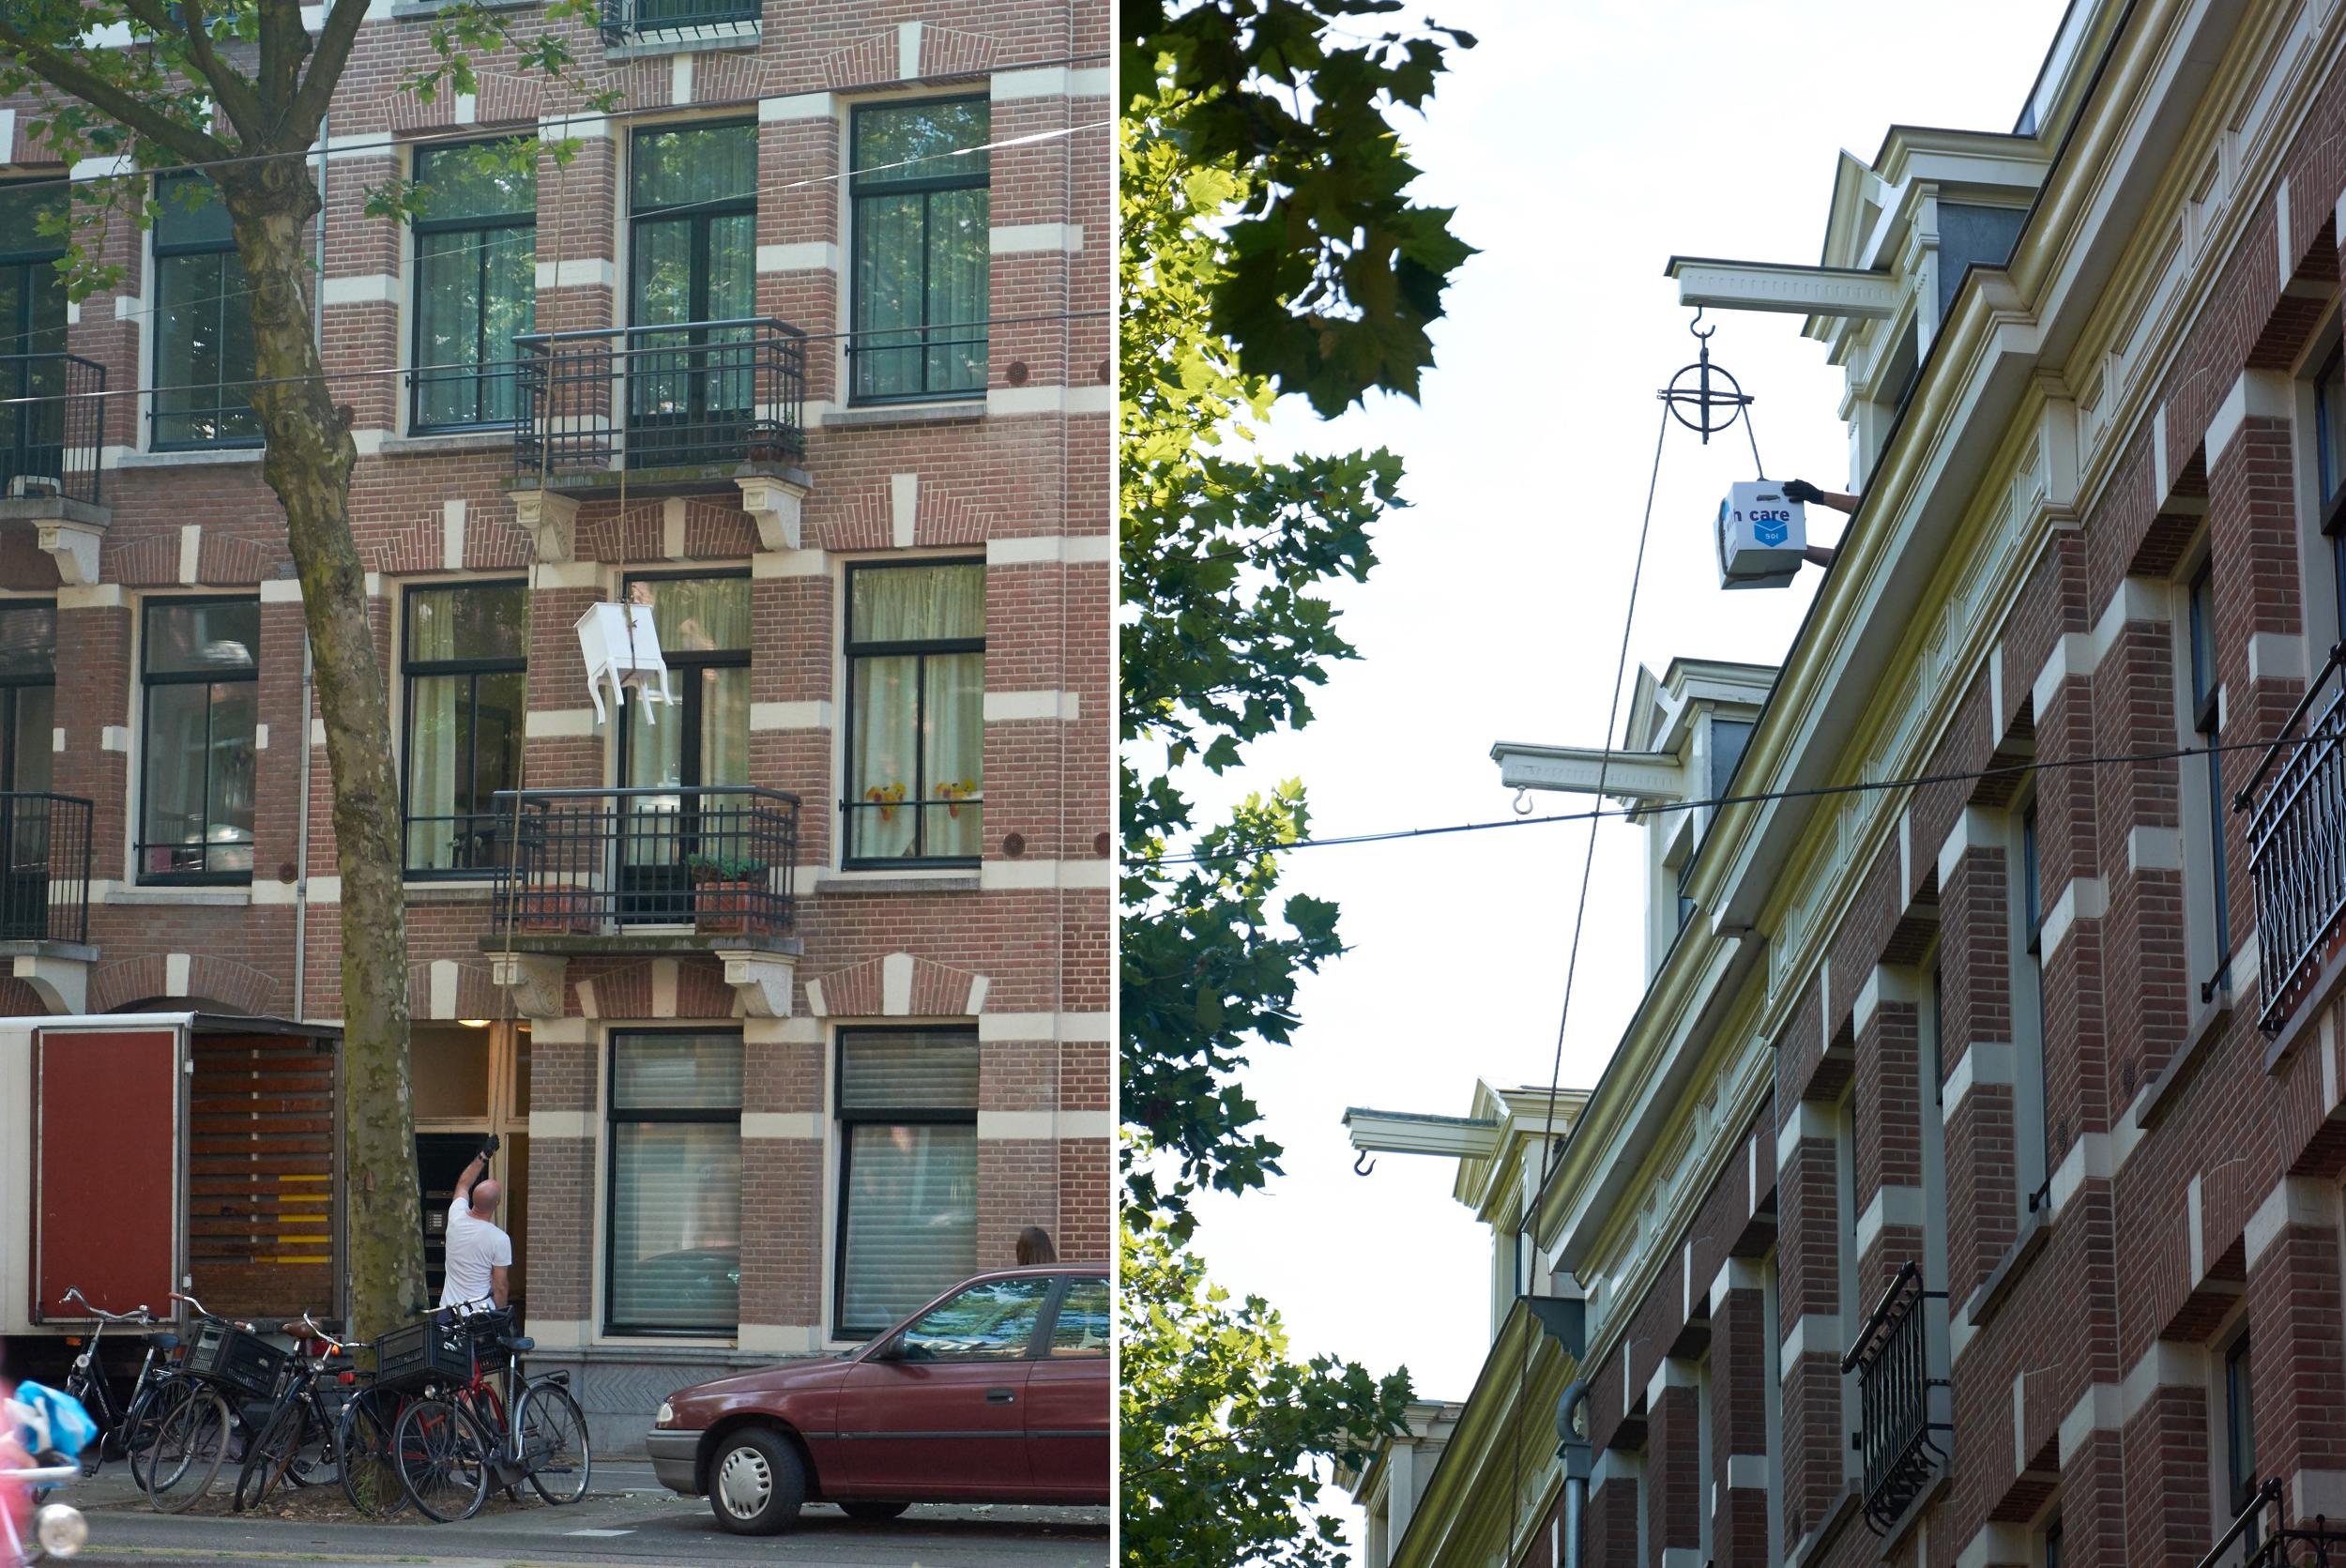 Amsterdam_flytning1